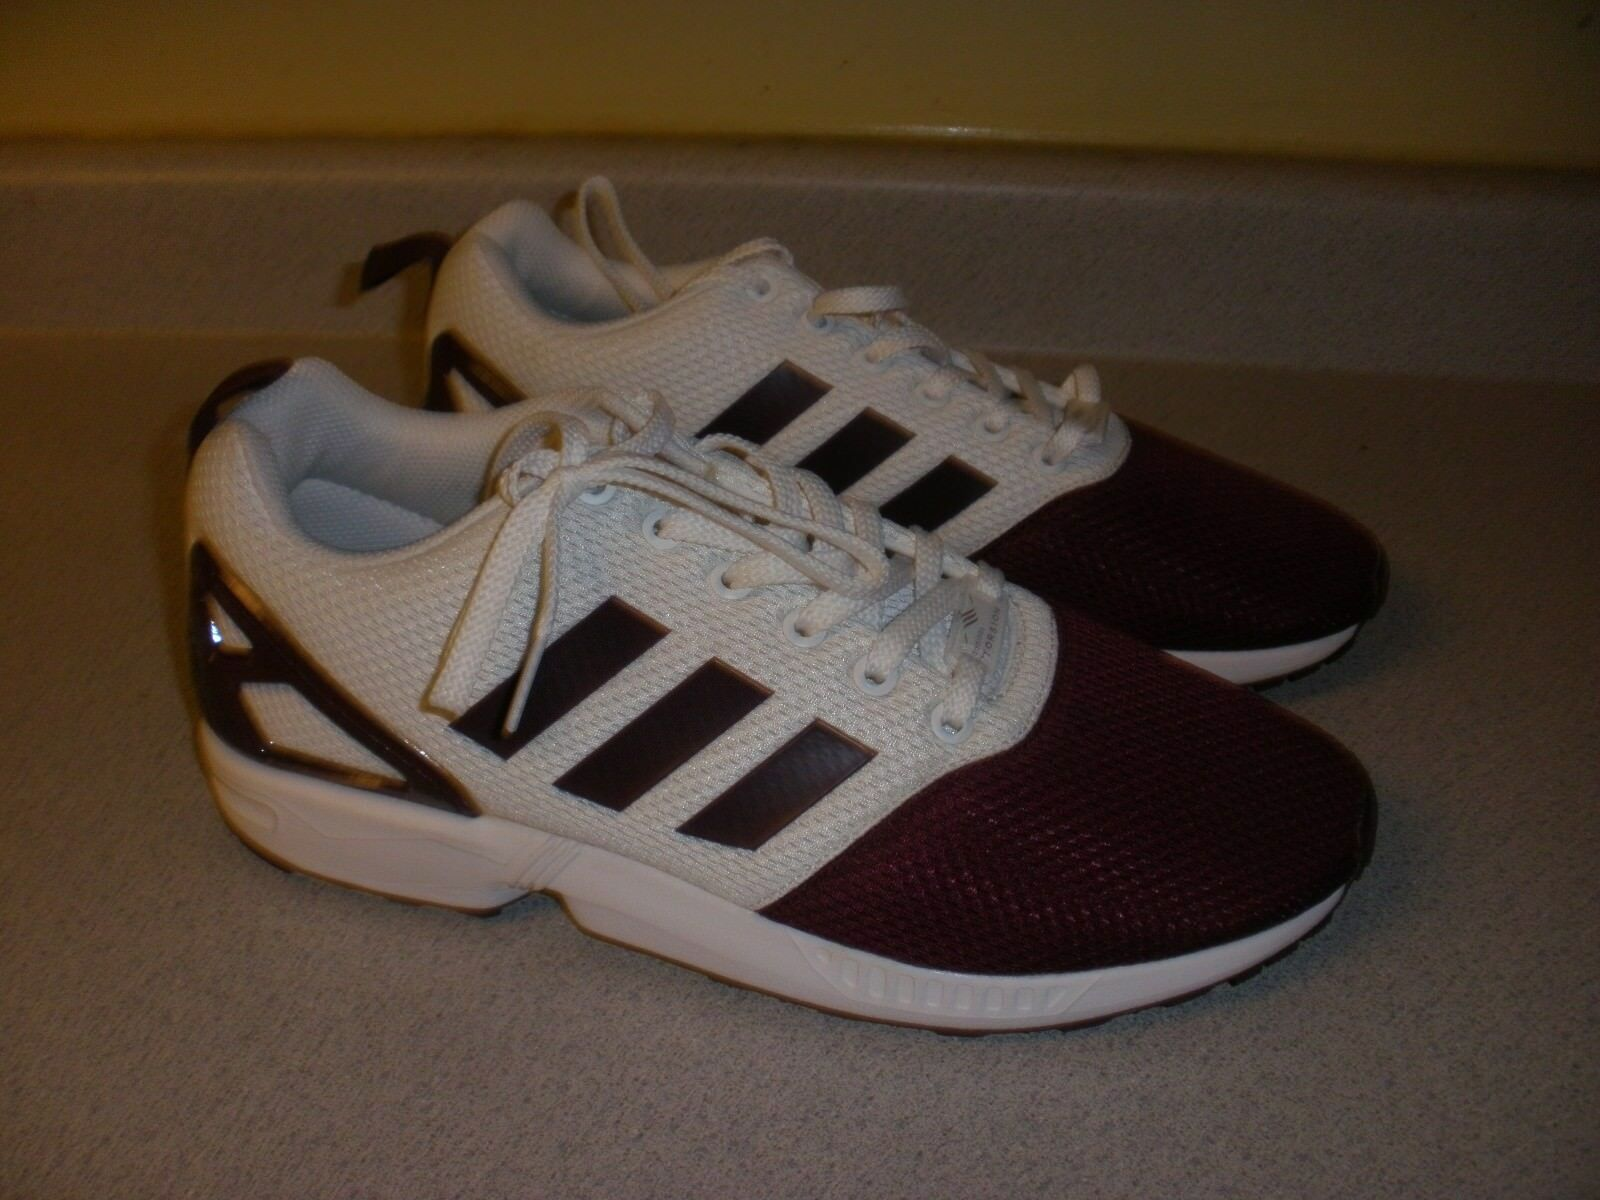 ADIDAS Torision Shoes size 9.5 MAROON WHITE